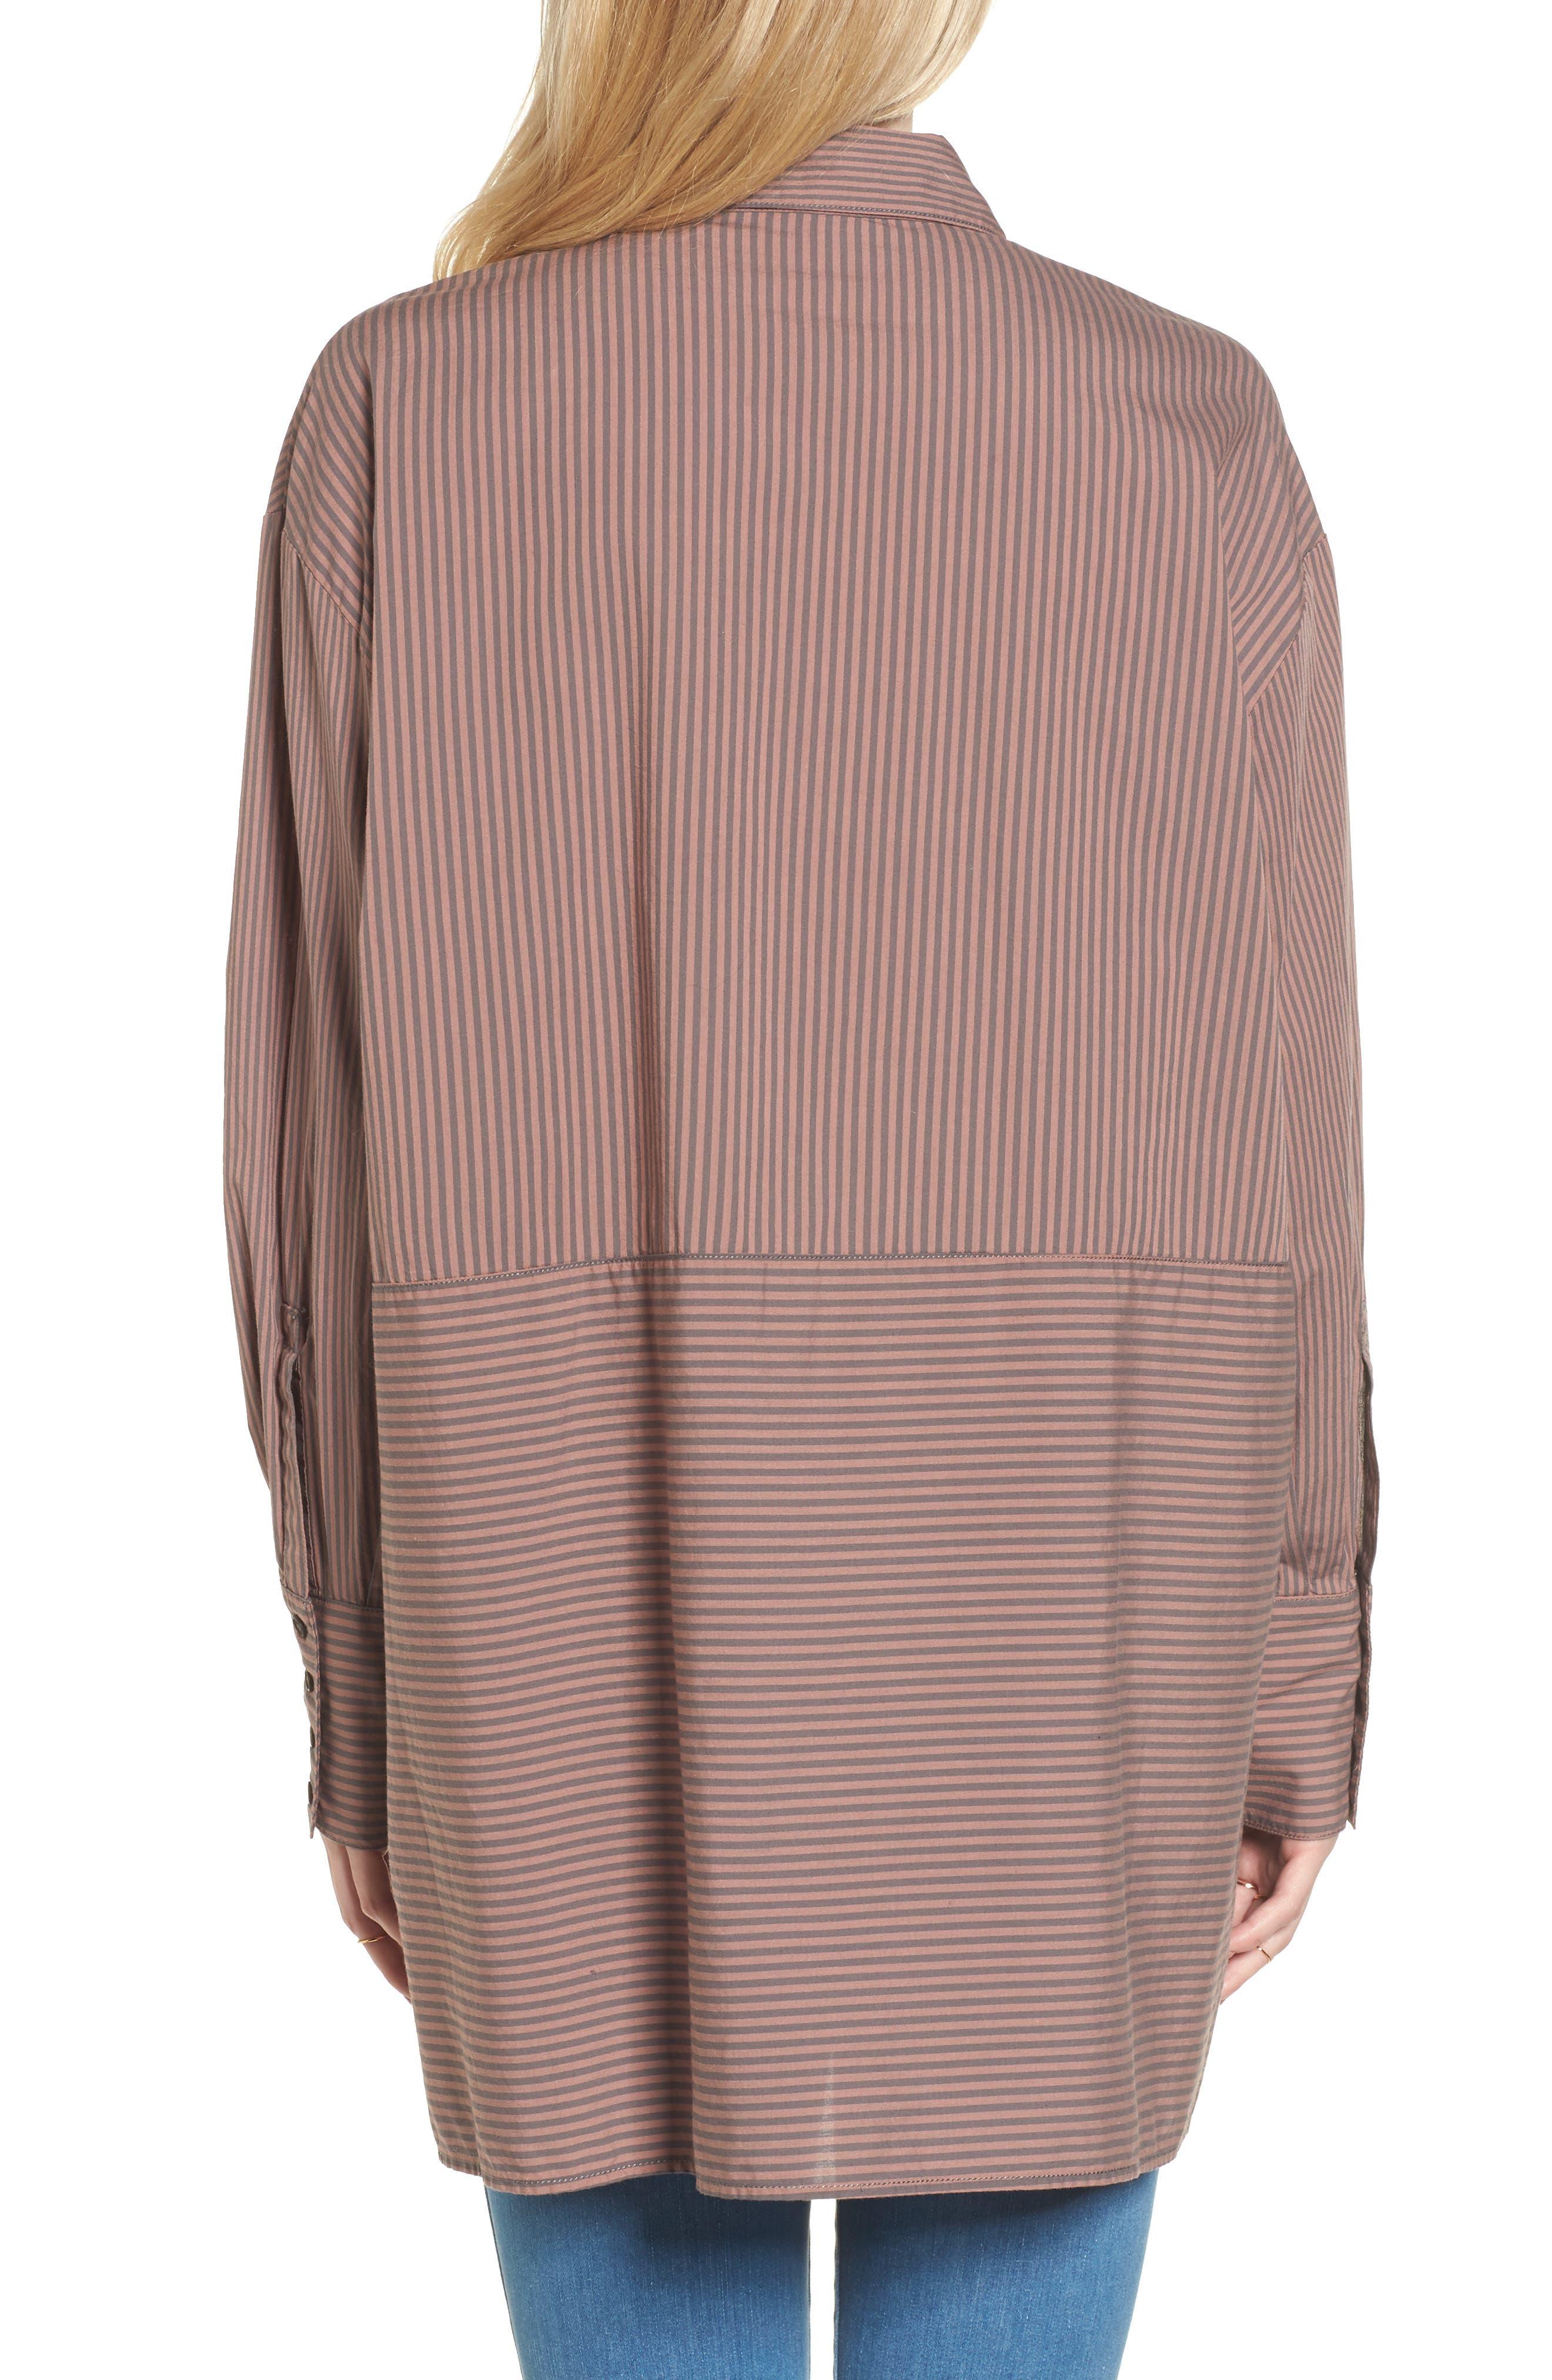 Lakehouse Oversize Shirt,                             Alternate thumbnail 2, color,                             Pink